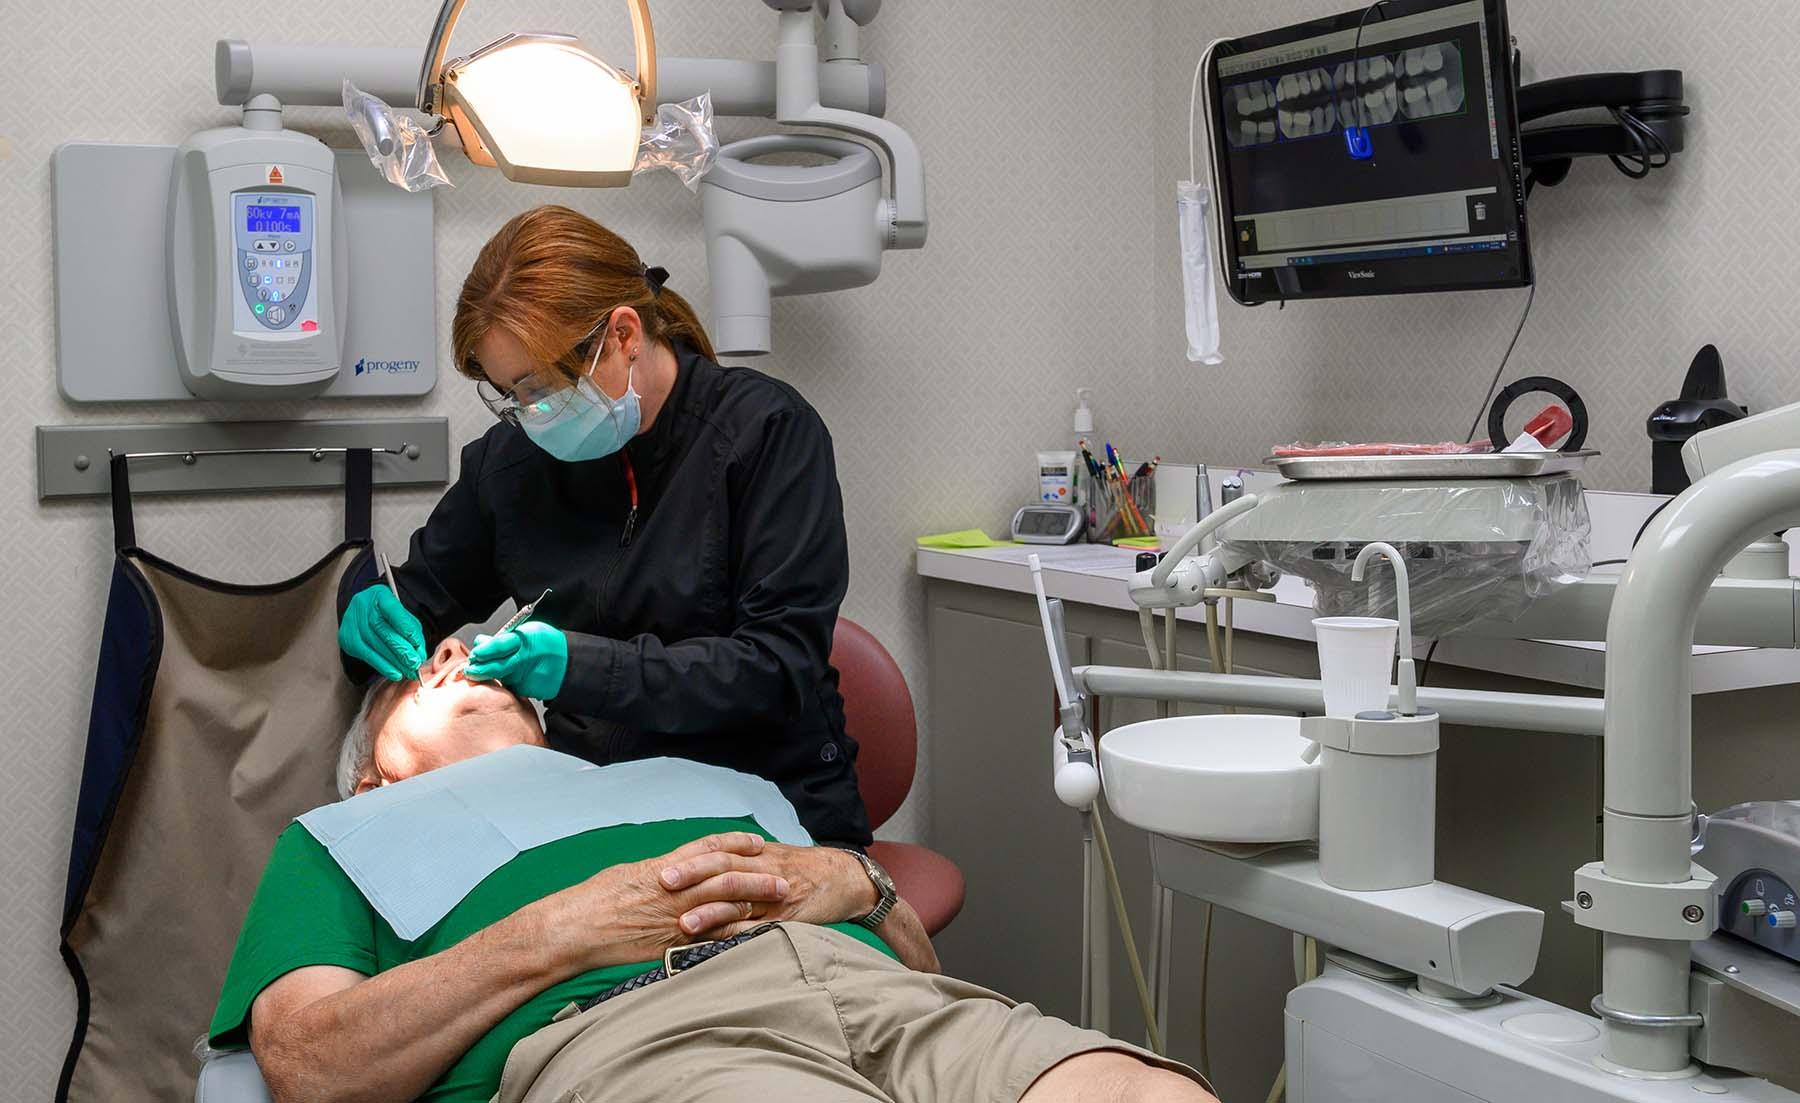 Preventative, comprehensive dental services